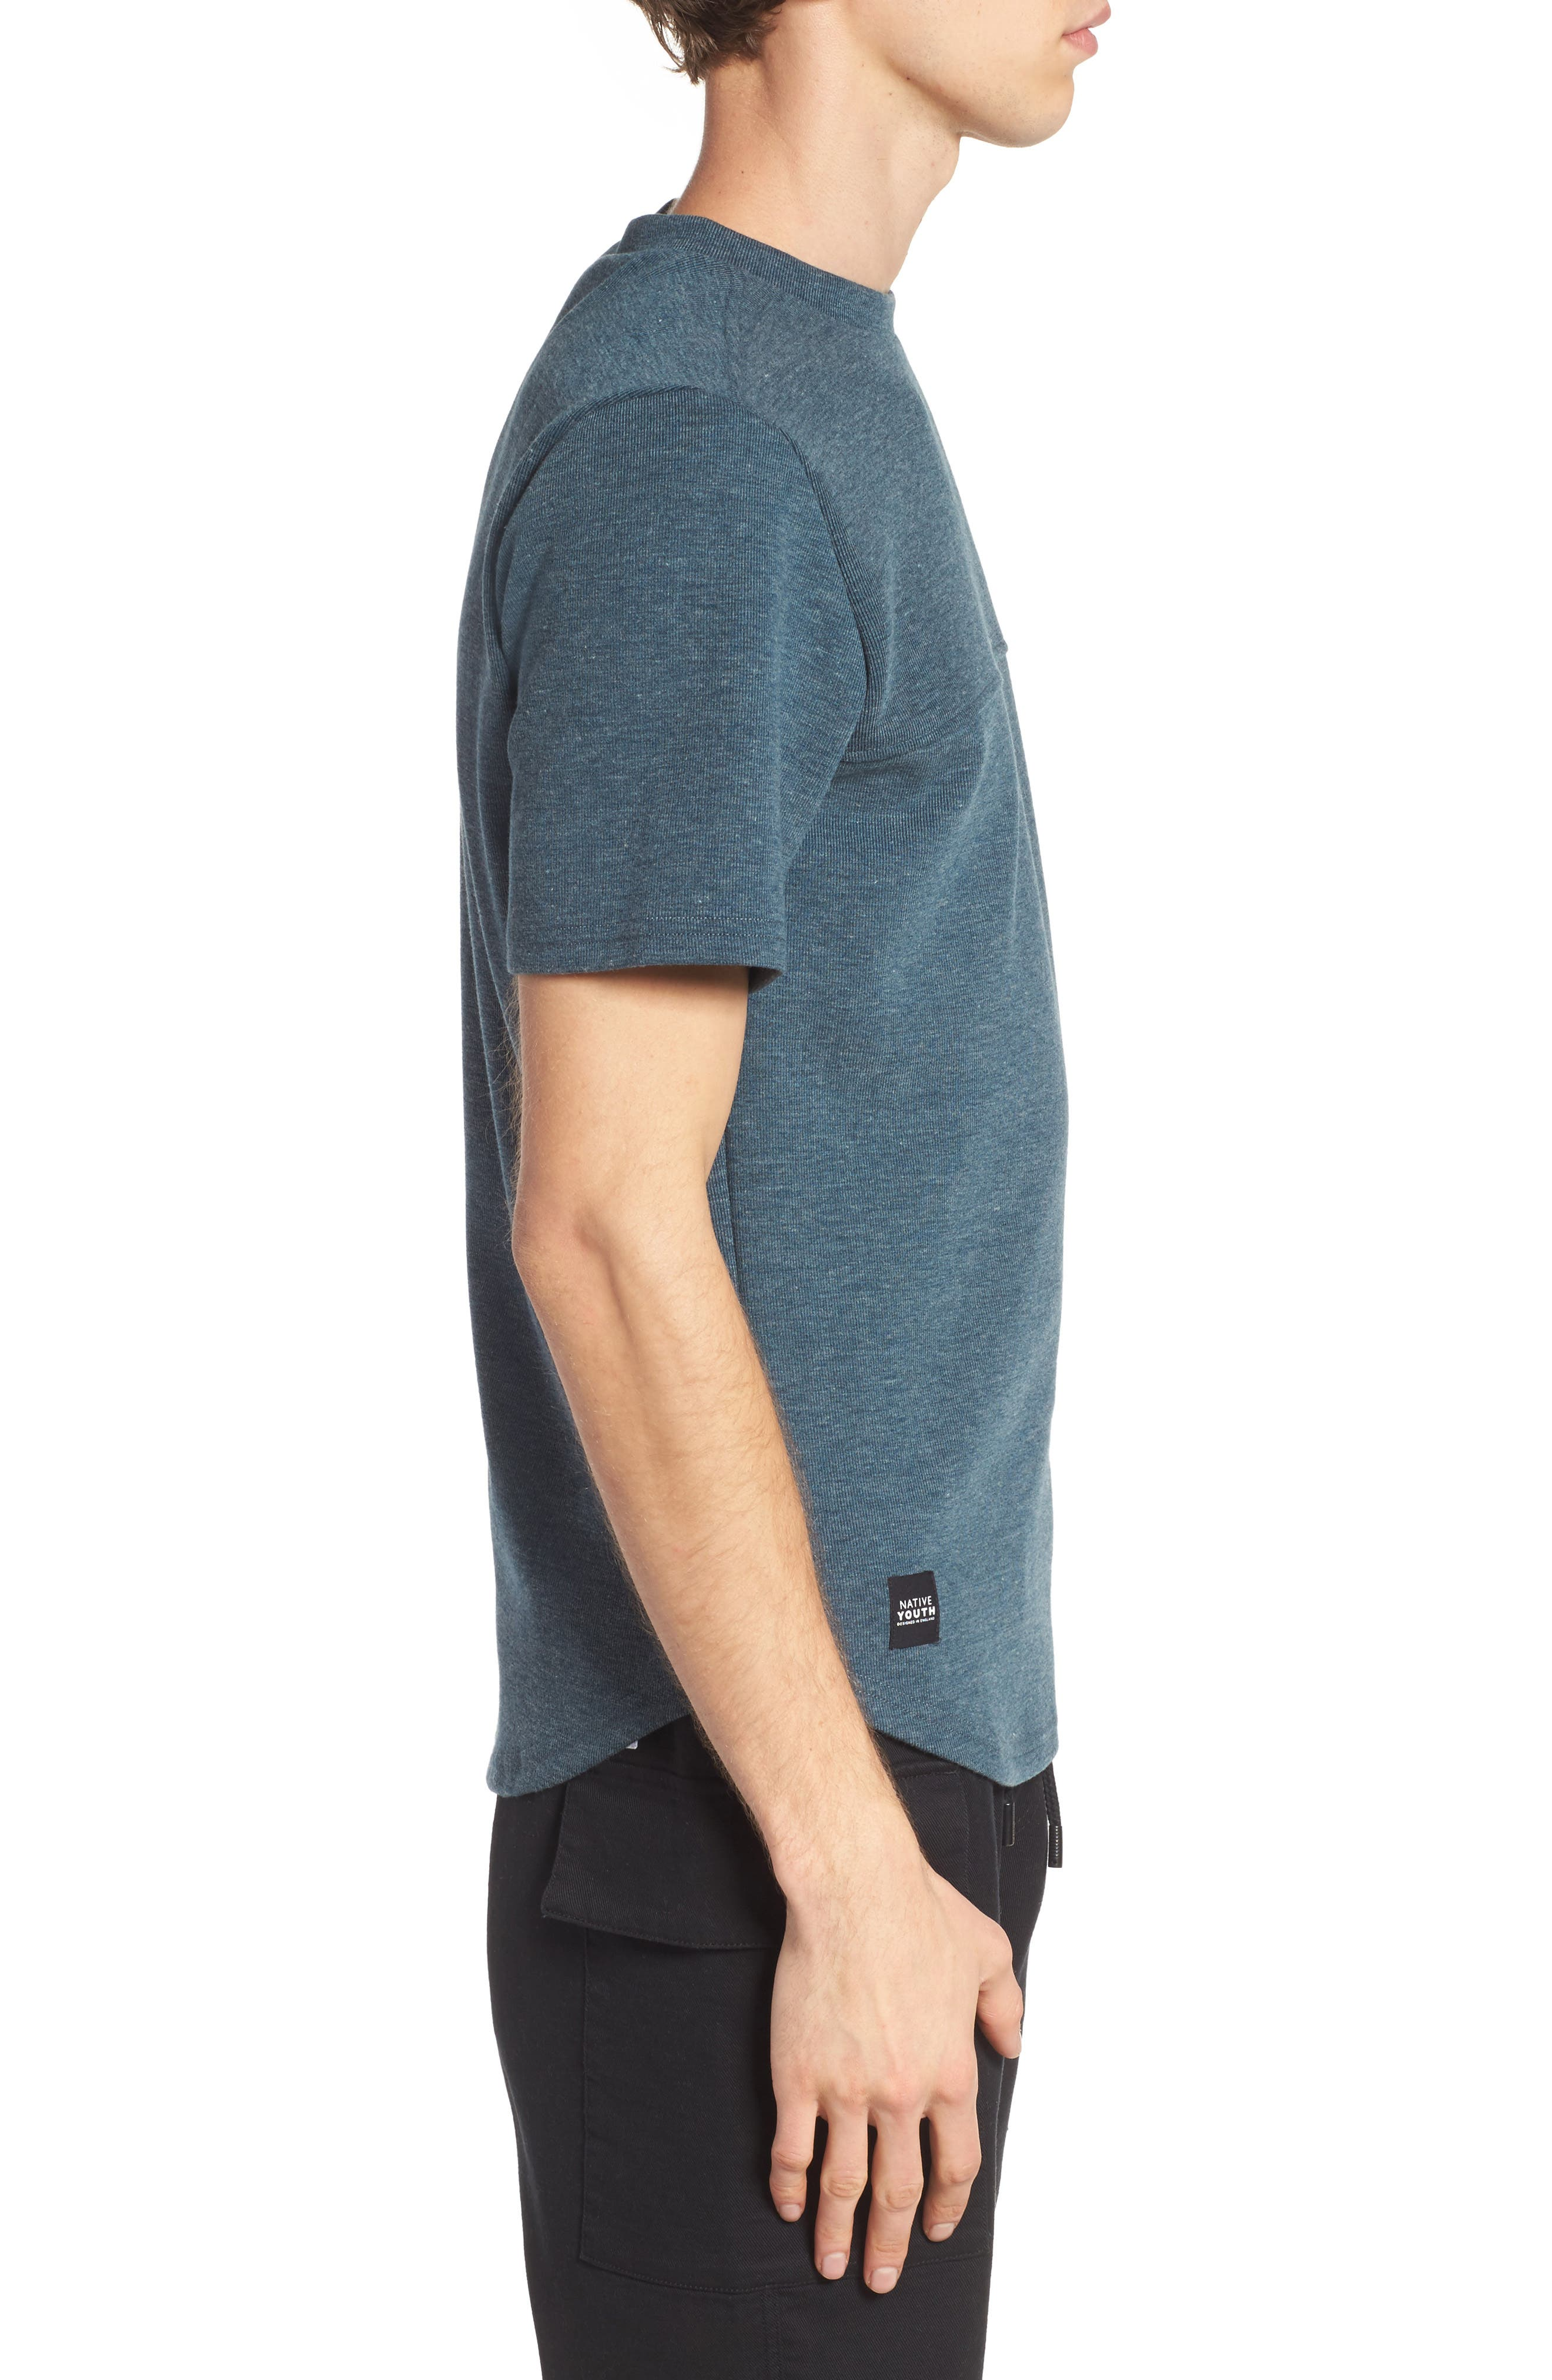 Onyx T-Shirt,                             Alternate thumbnail 3, color,                             Teal